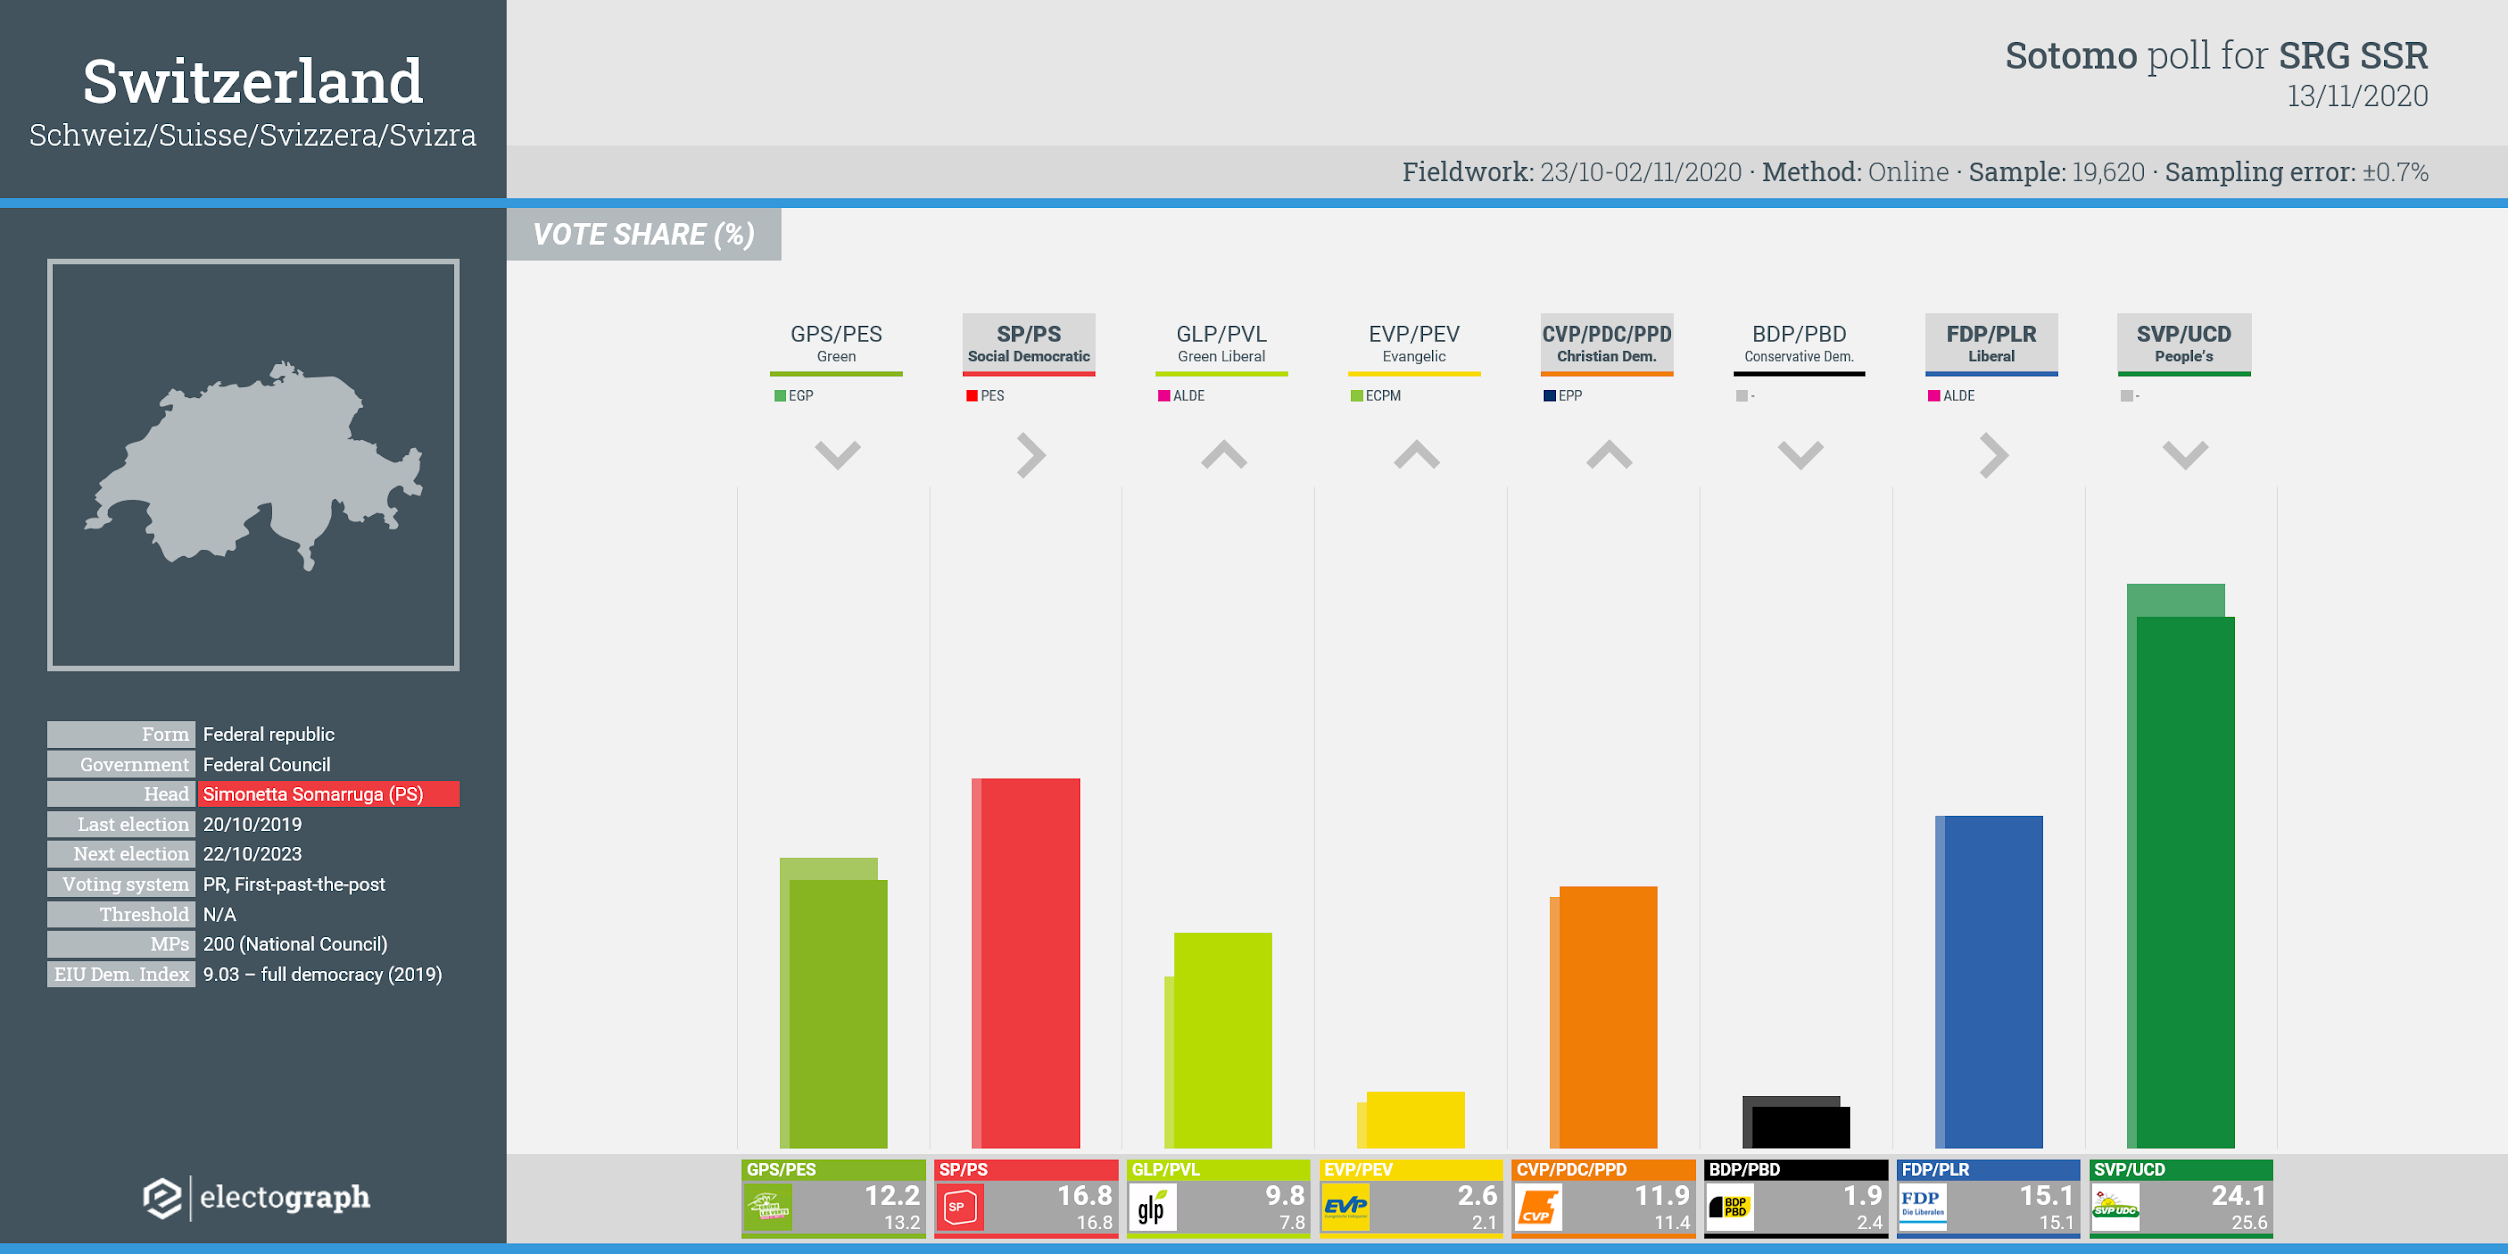 SWITZERLAND: Sotomo poll chart for SRG SSR, 13 November 2020